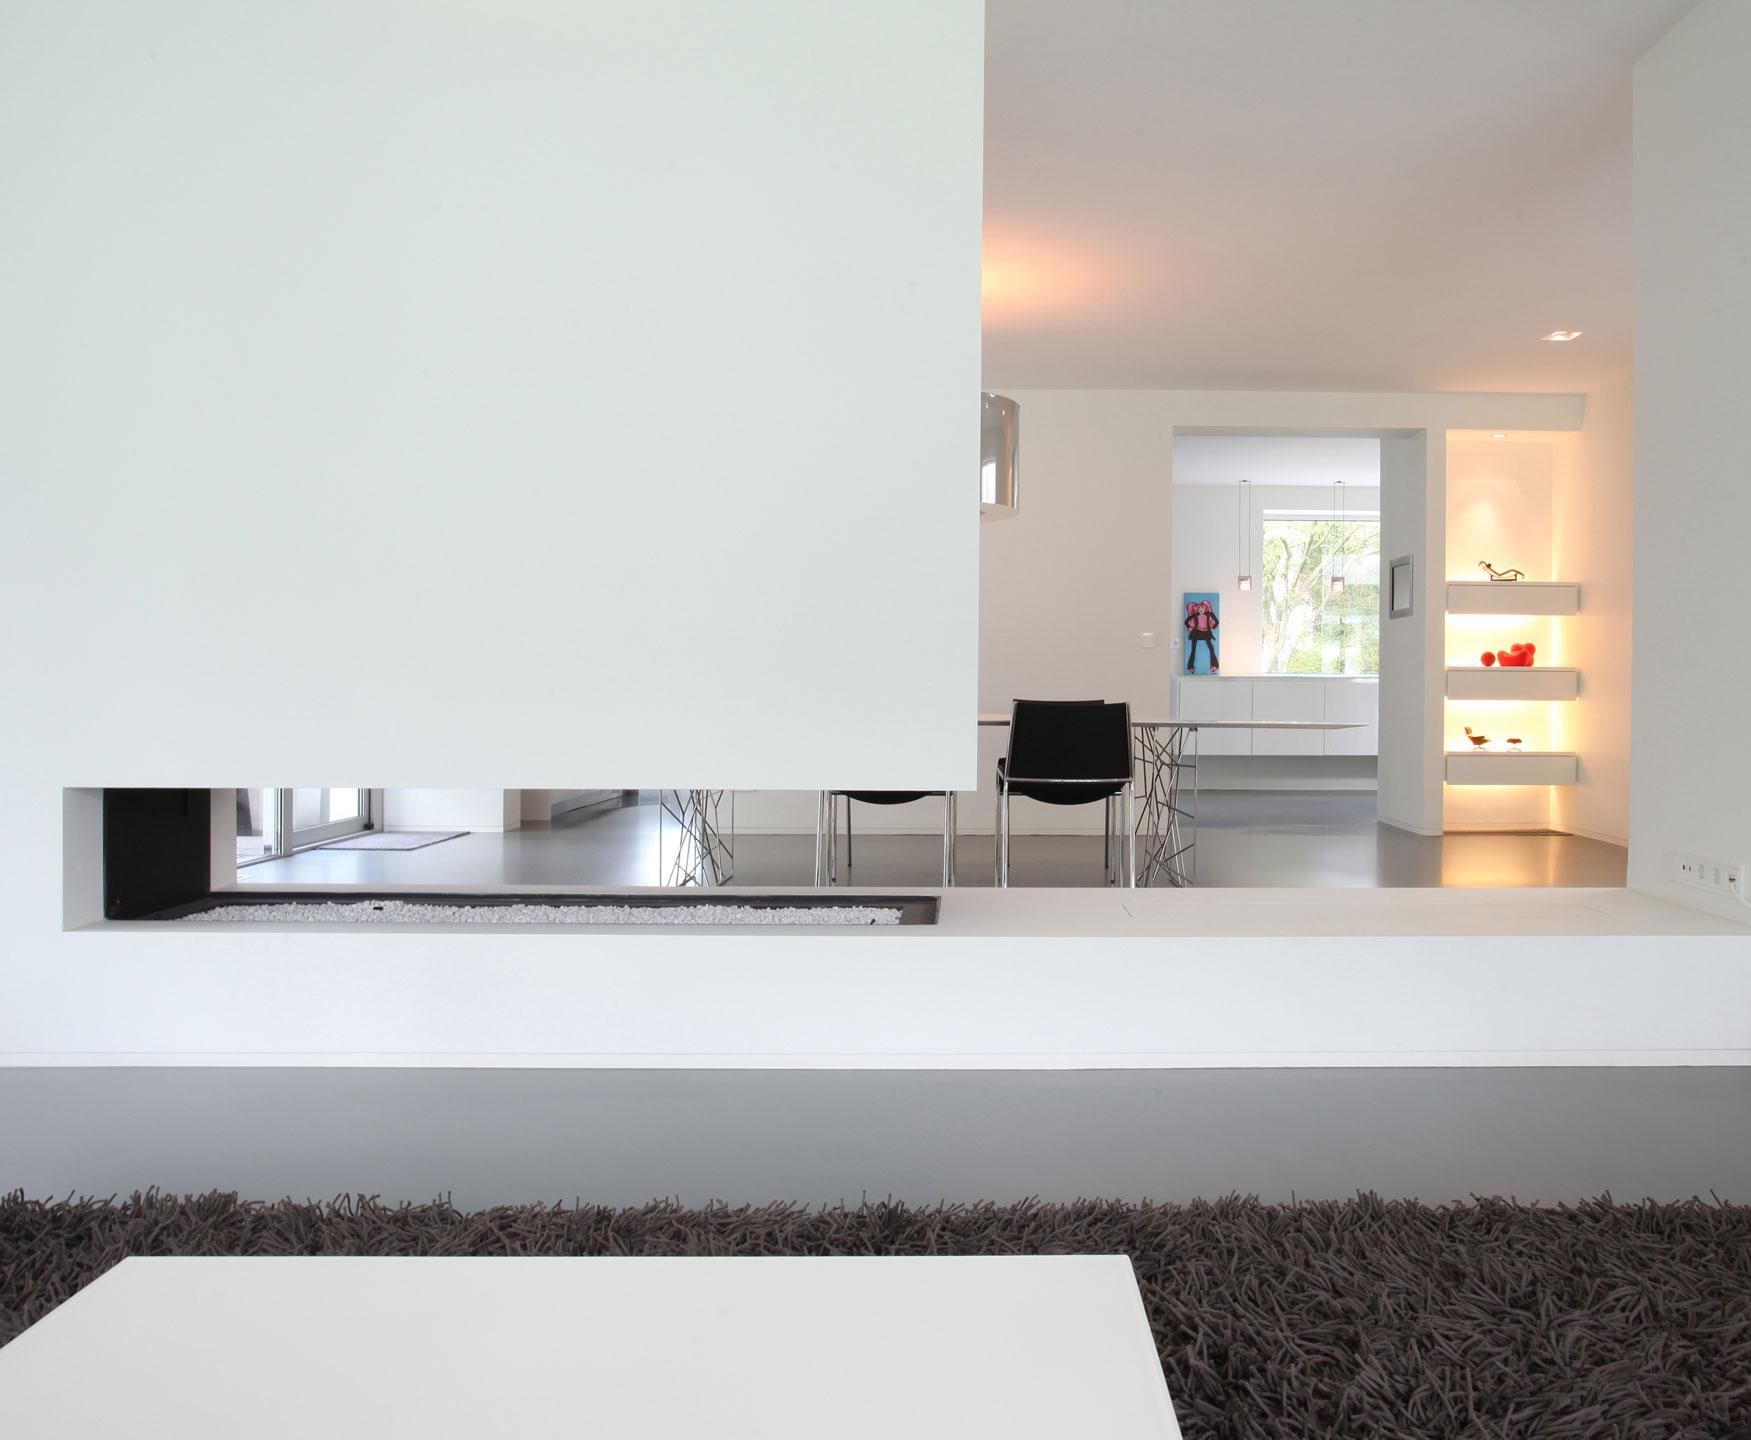 G house simplicity love